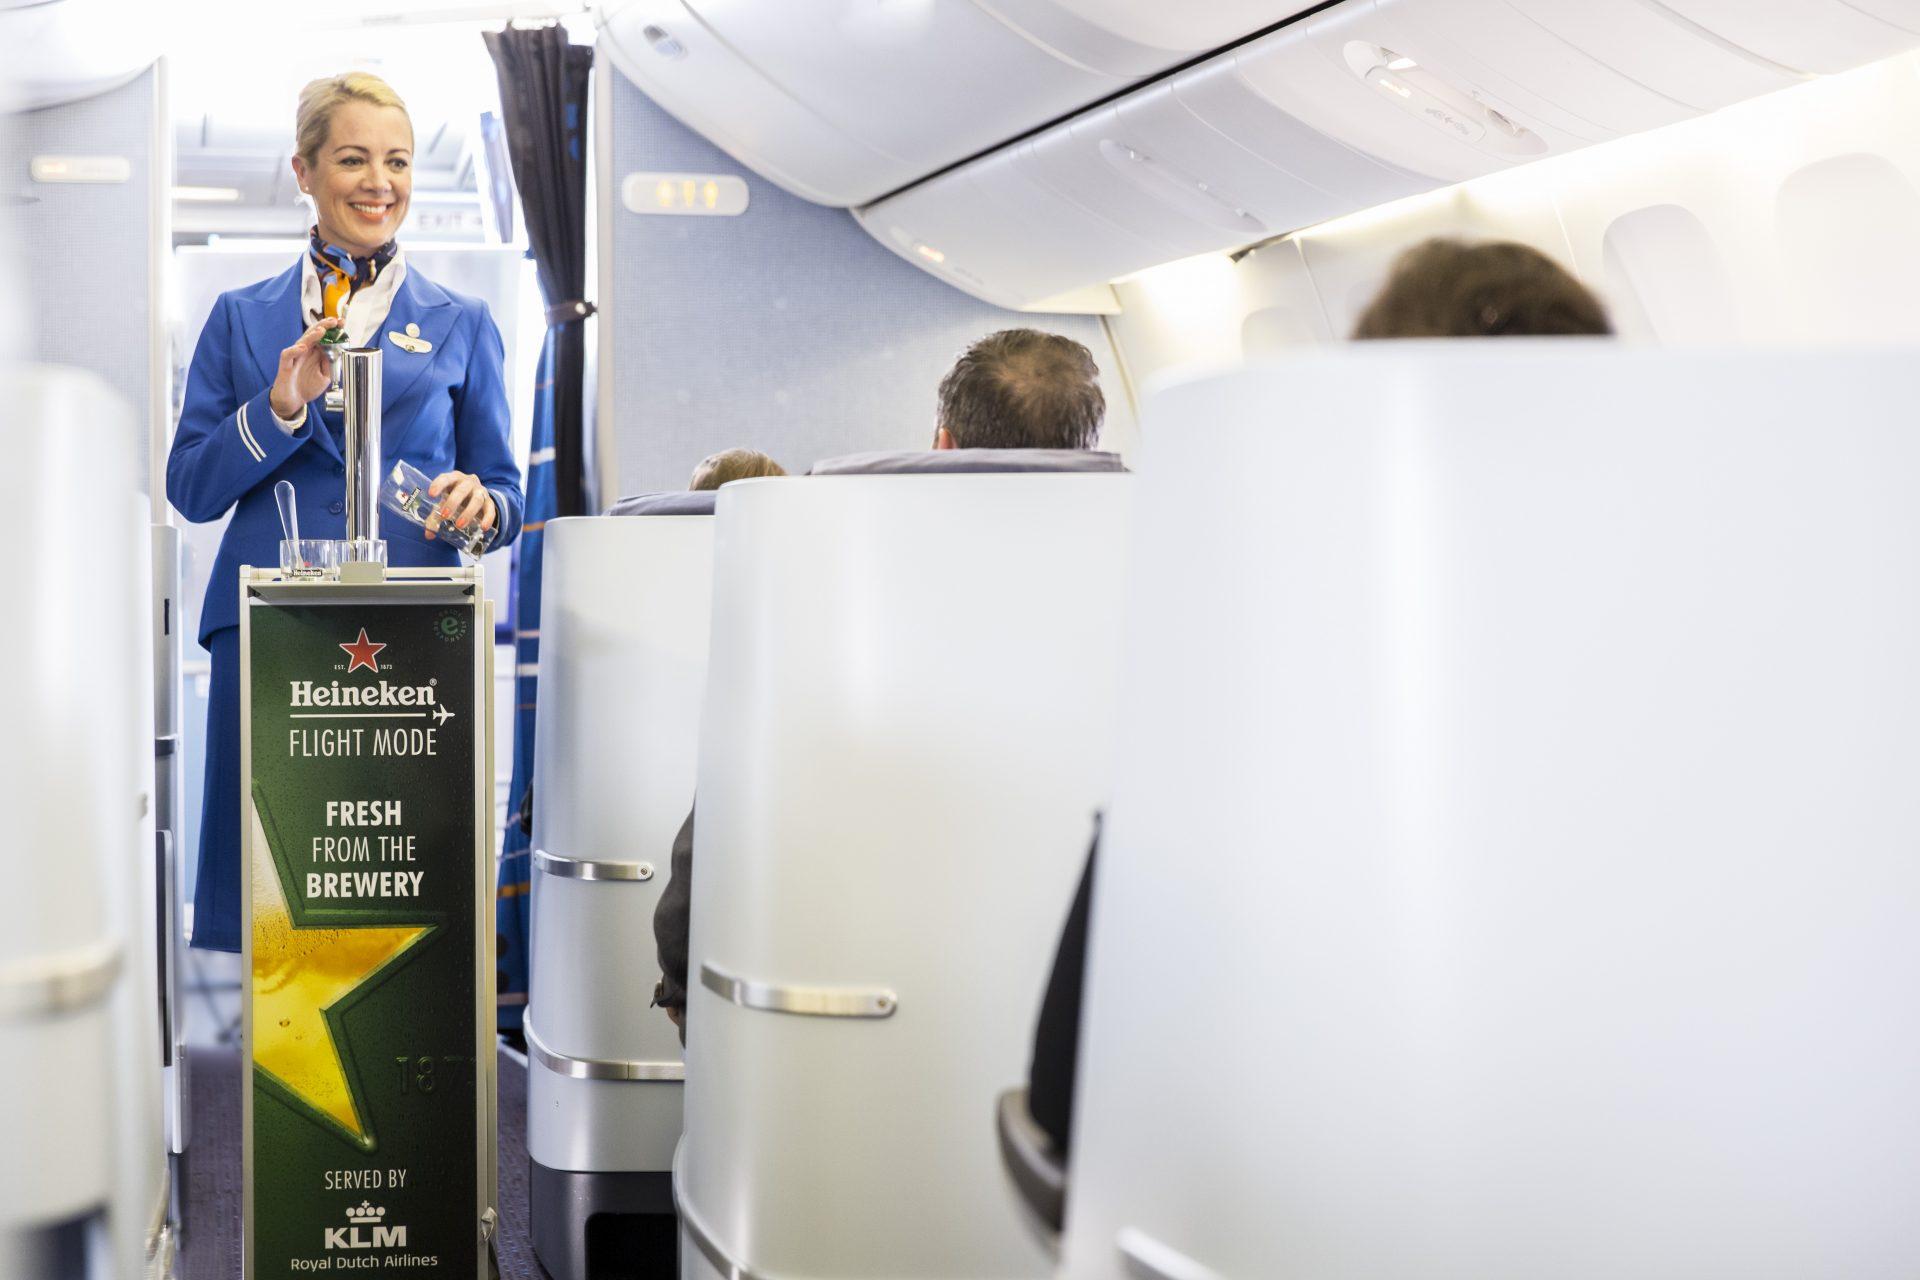 KLM sirve en los aires cerveza de barril